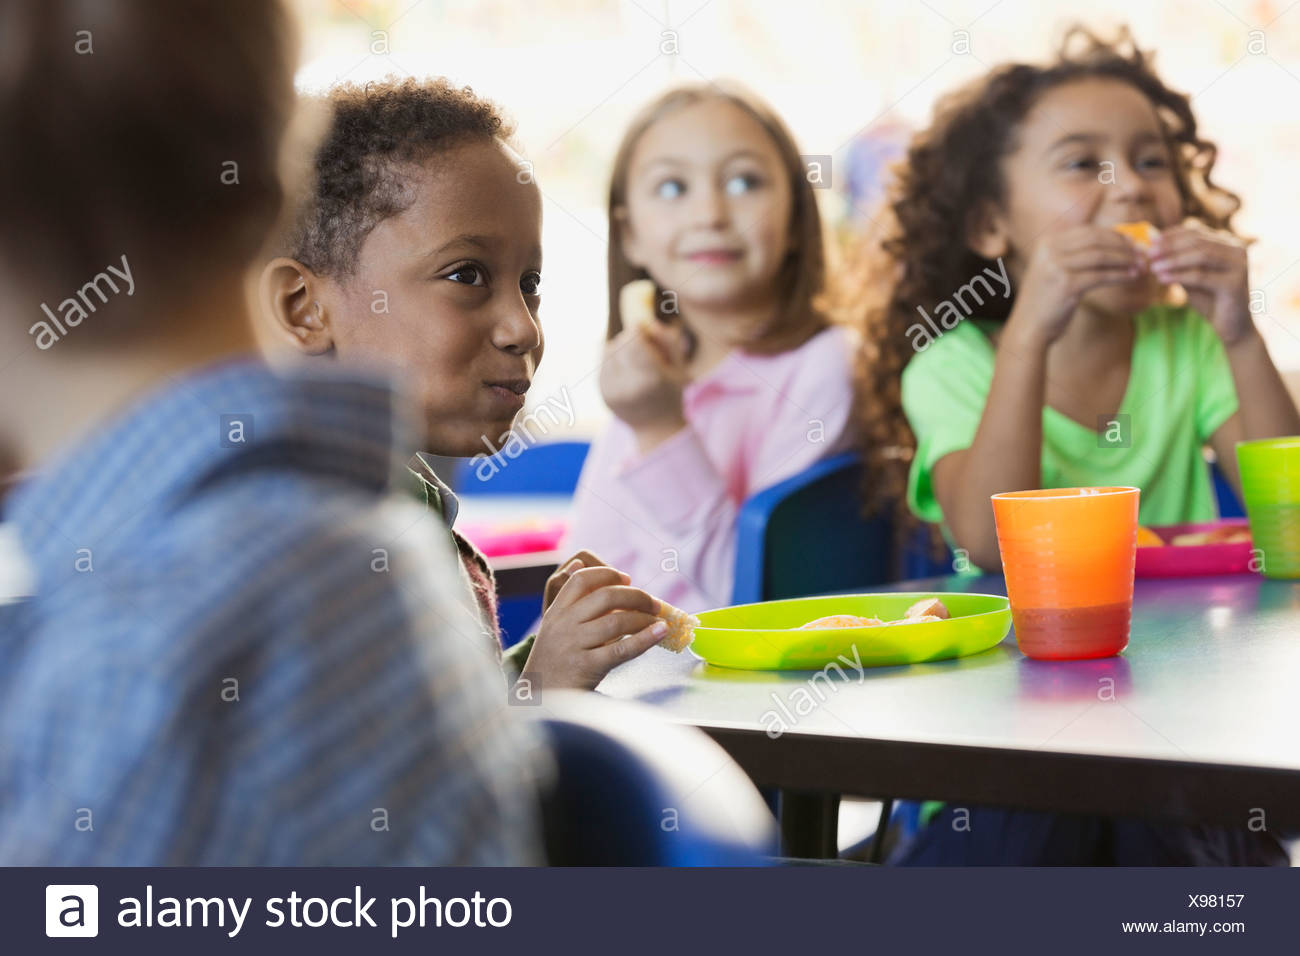 Children eating snacks in elementary school classroom - Stock Image